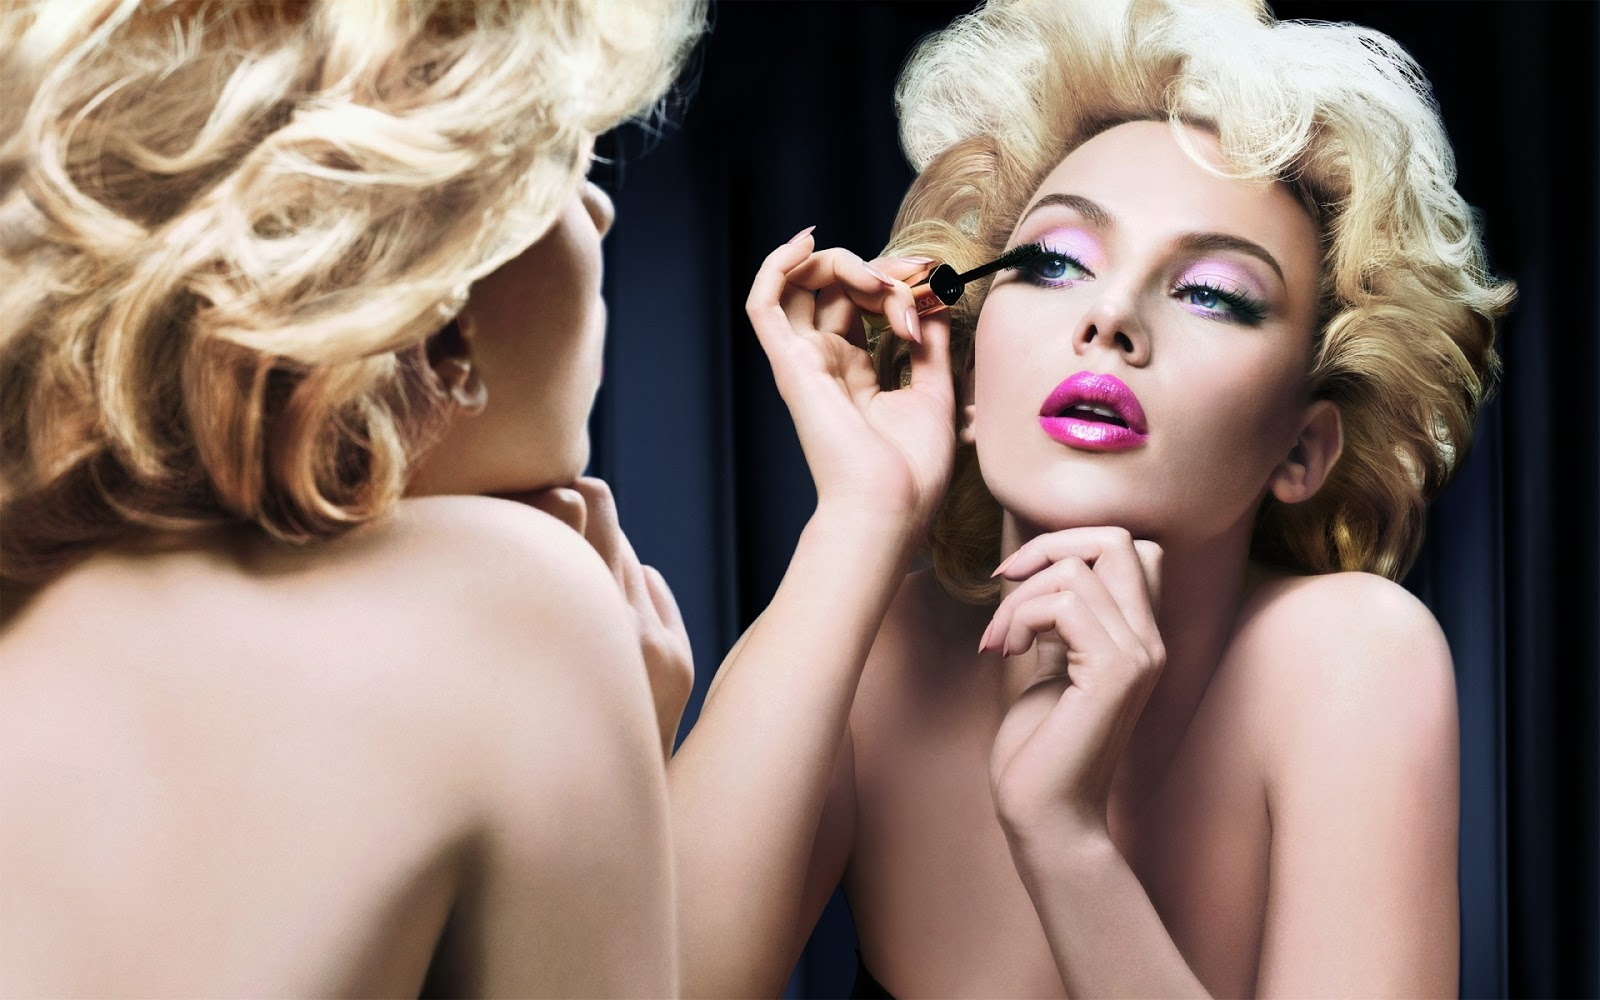 http://1.bp.blogspot.com/-z5f2xlsbFmA/TwJxL4W2DZI/AAAAAAAAAw8/L8TuHmlbH5E/s1600/scarlett-johansson-makeup-wallpaper-1226--1920-x-1200-widescreen.jpg